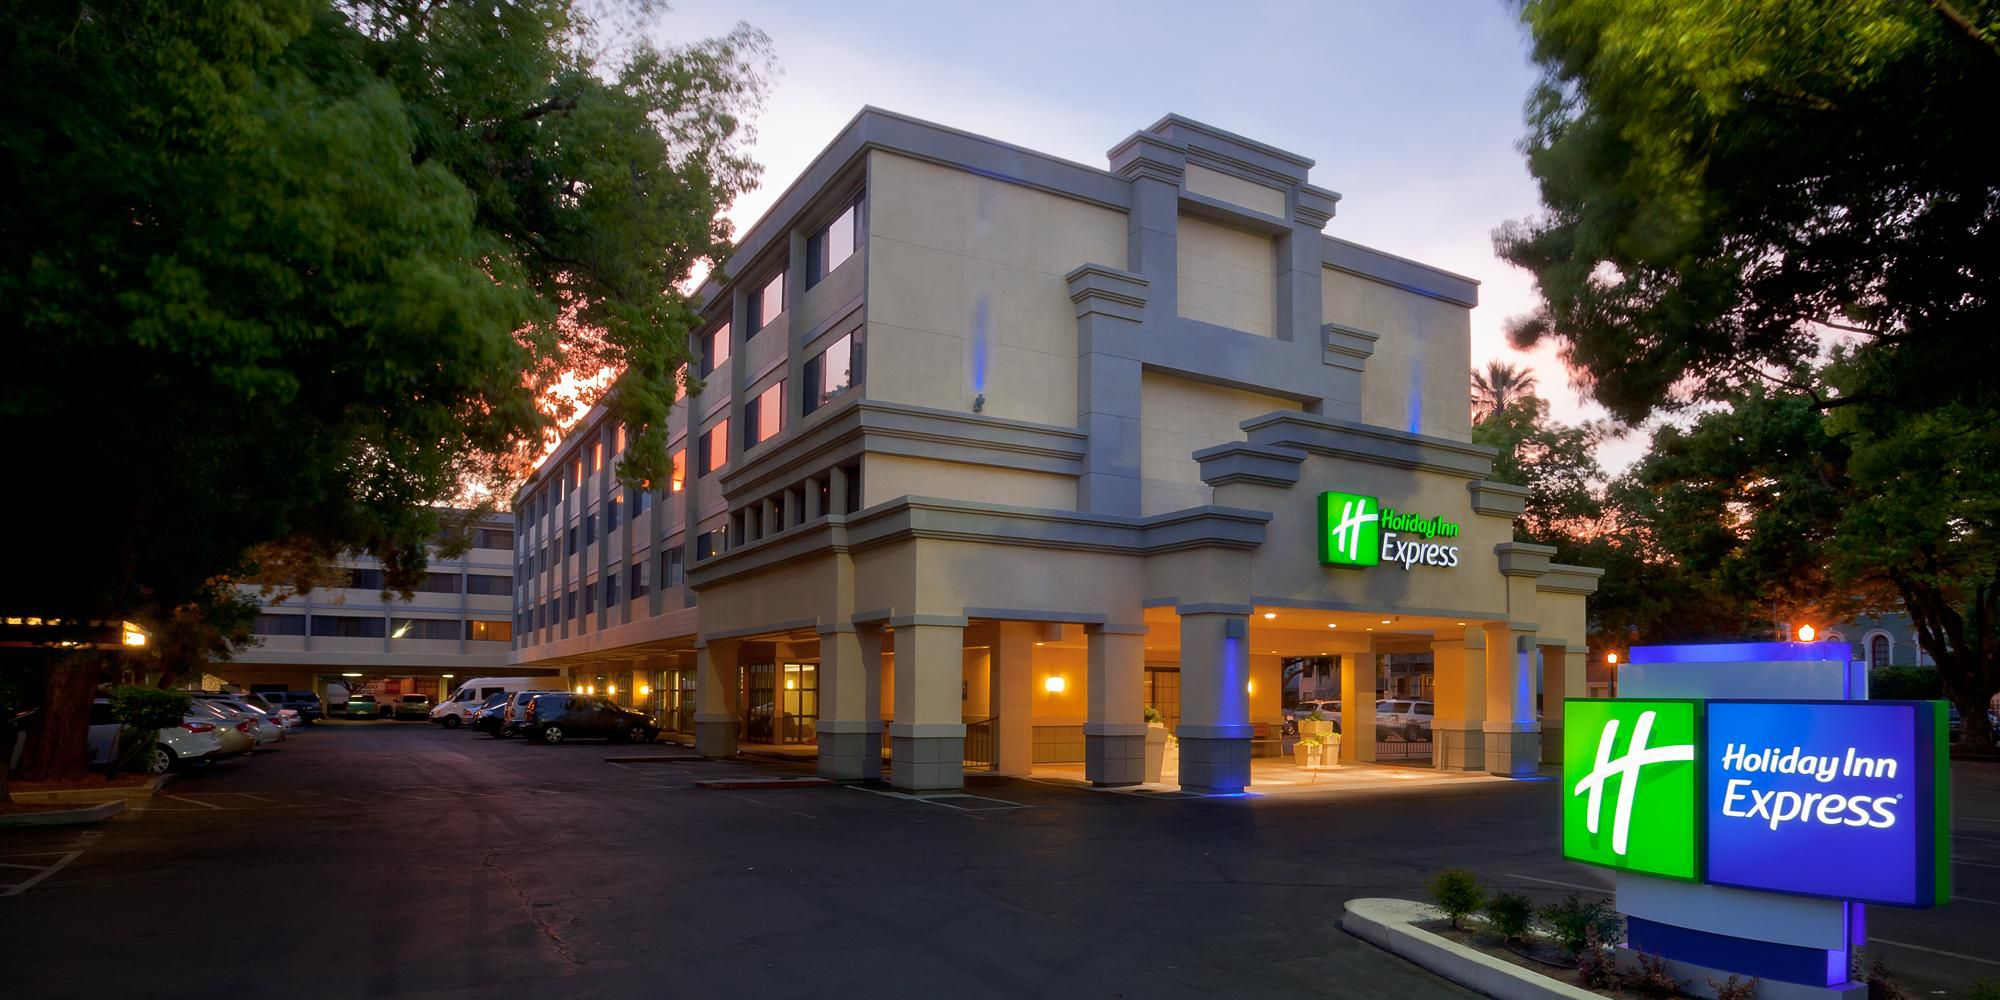 Holiday Inn Express Sacramento 2532228819 2x1